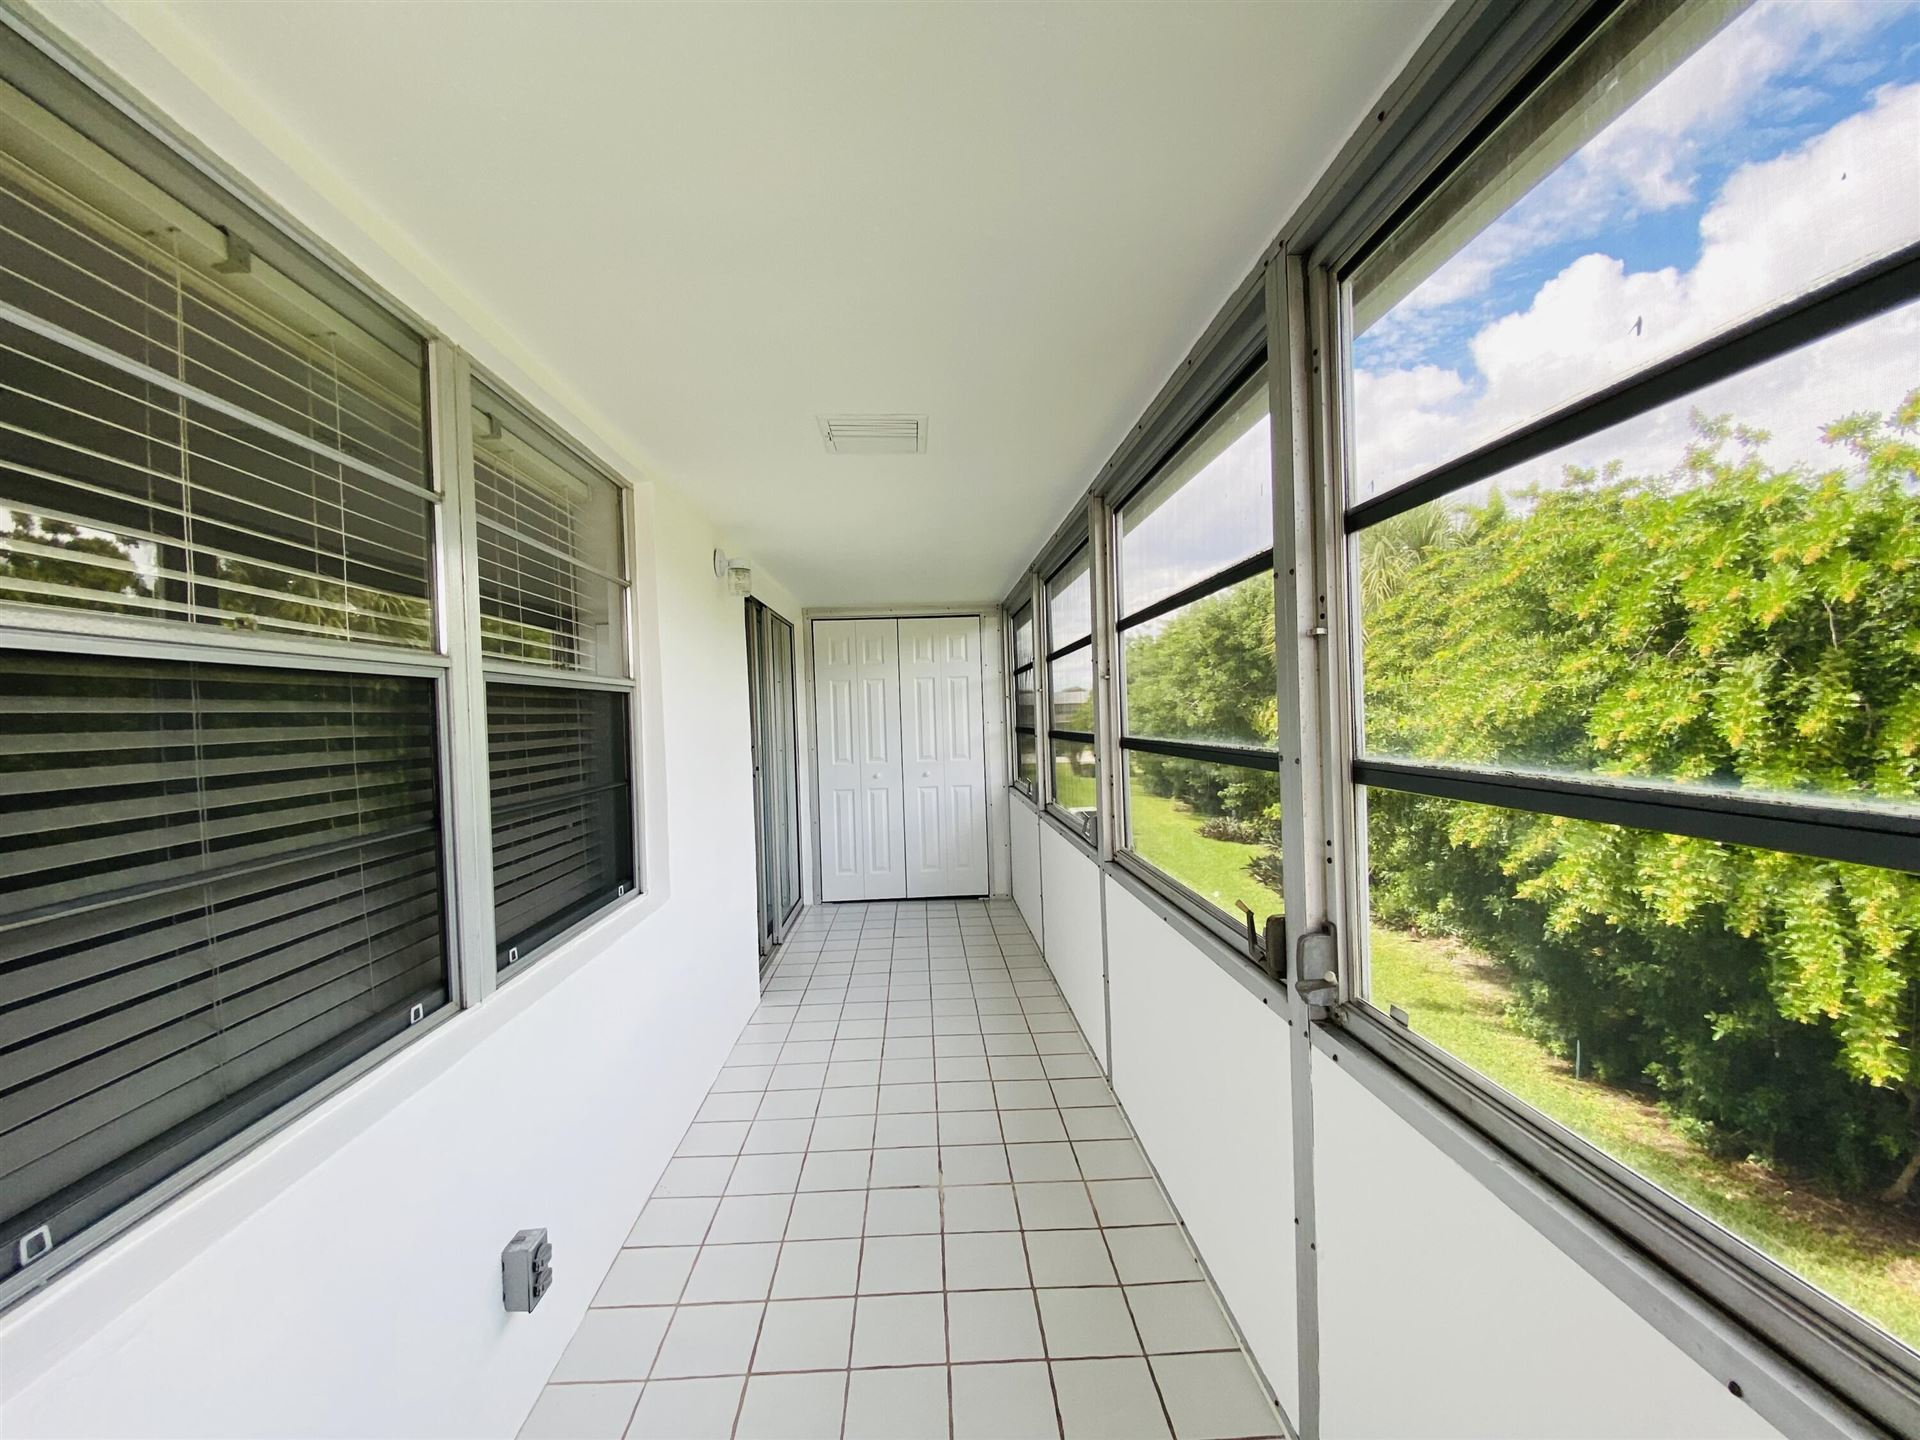 100 Kingswood E, West Palm Beach, FL 33417 - MLS#: RX-10753747